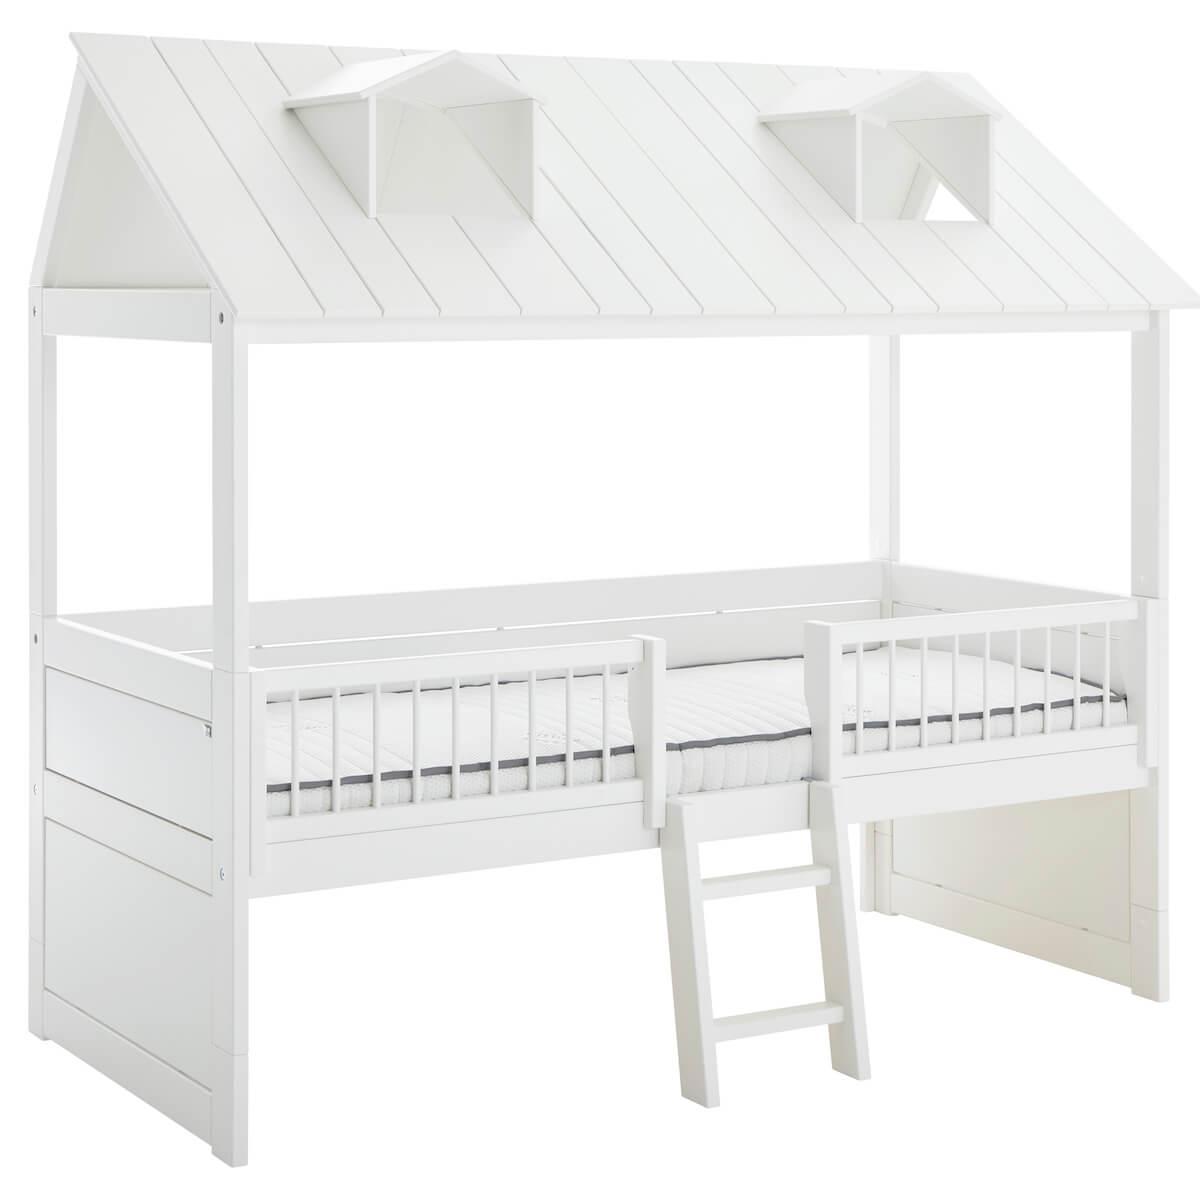 Bett + Rollrost 90x200cm zentrale Leiter BEACH HOUSE Lifetime weiß